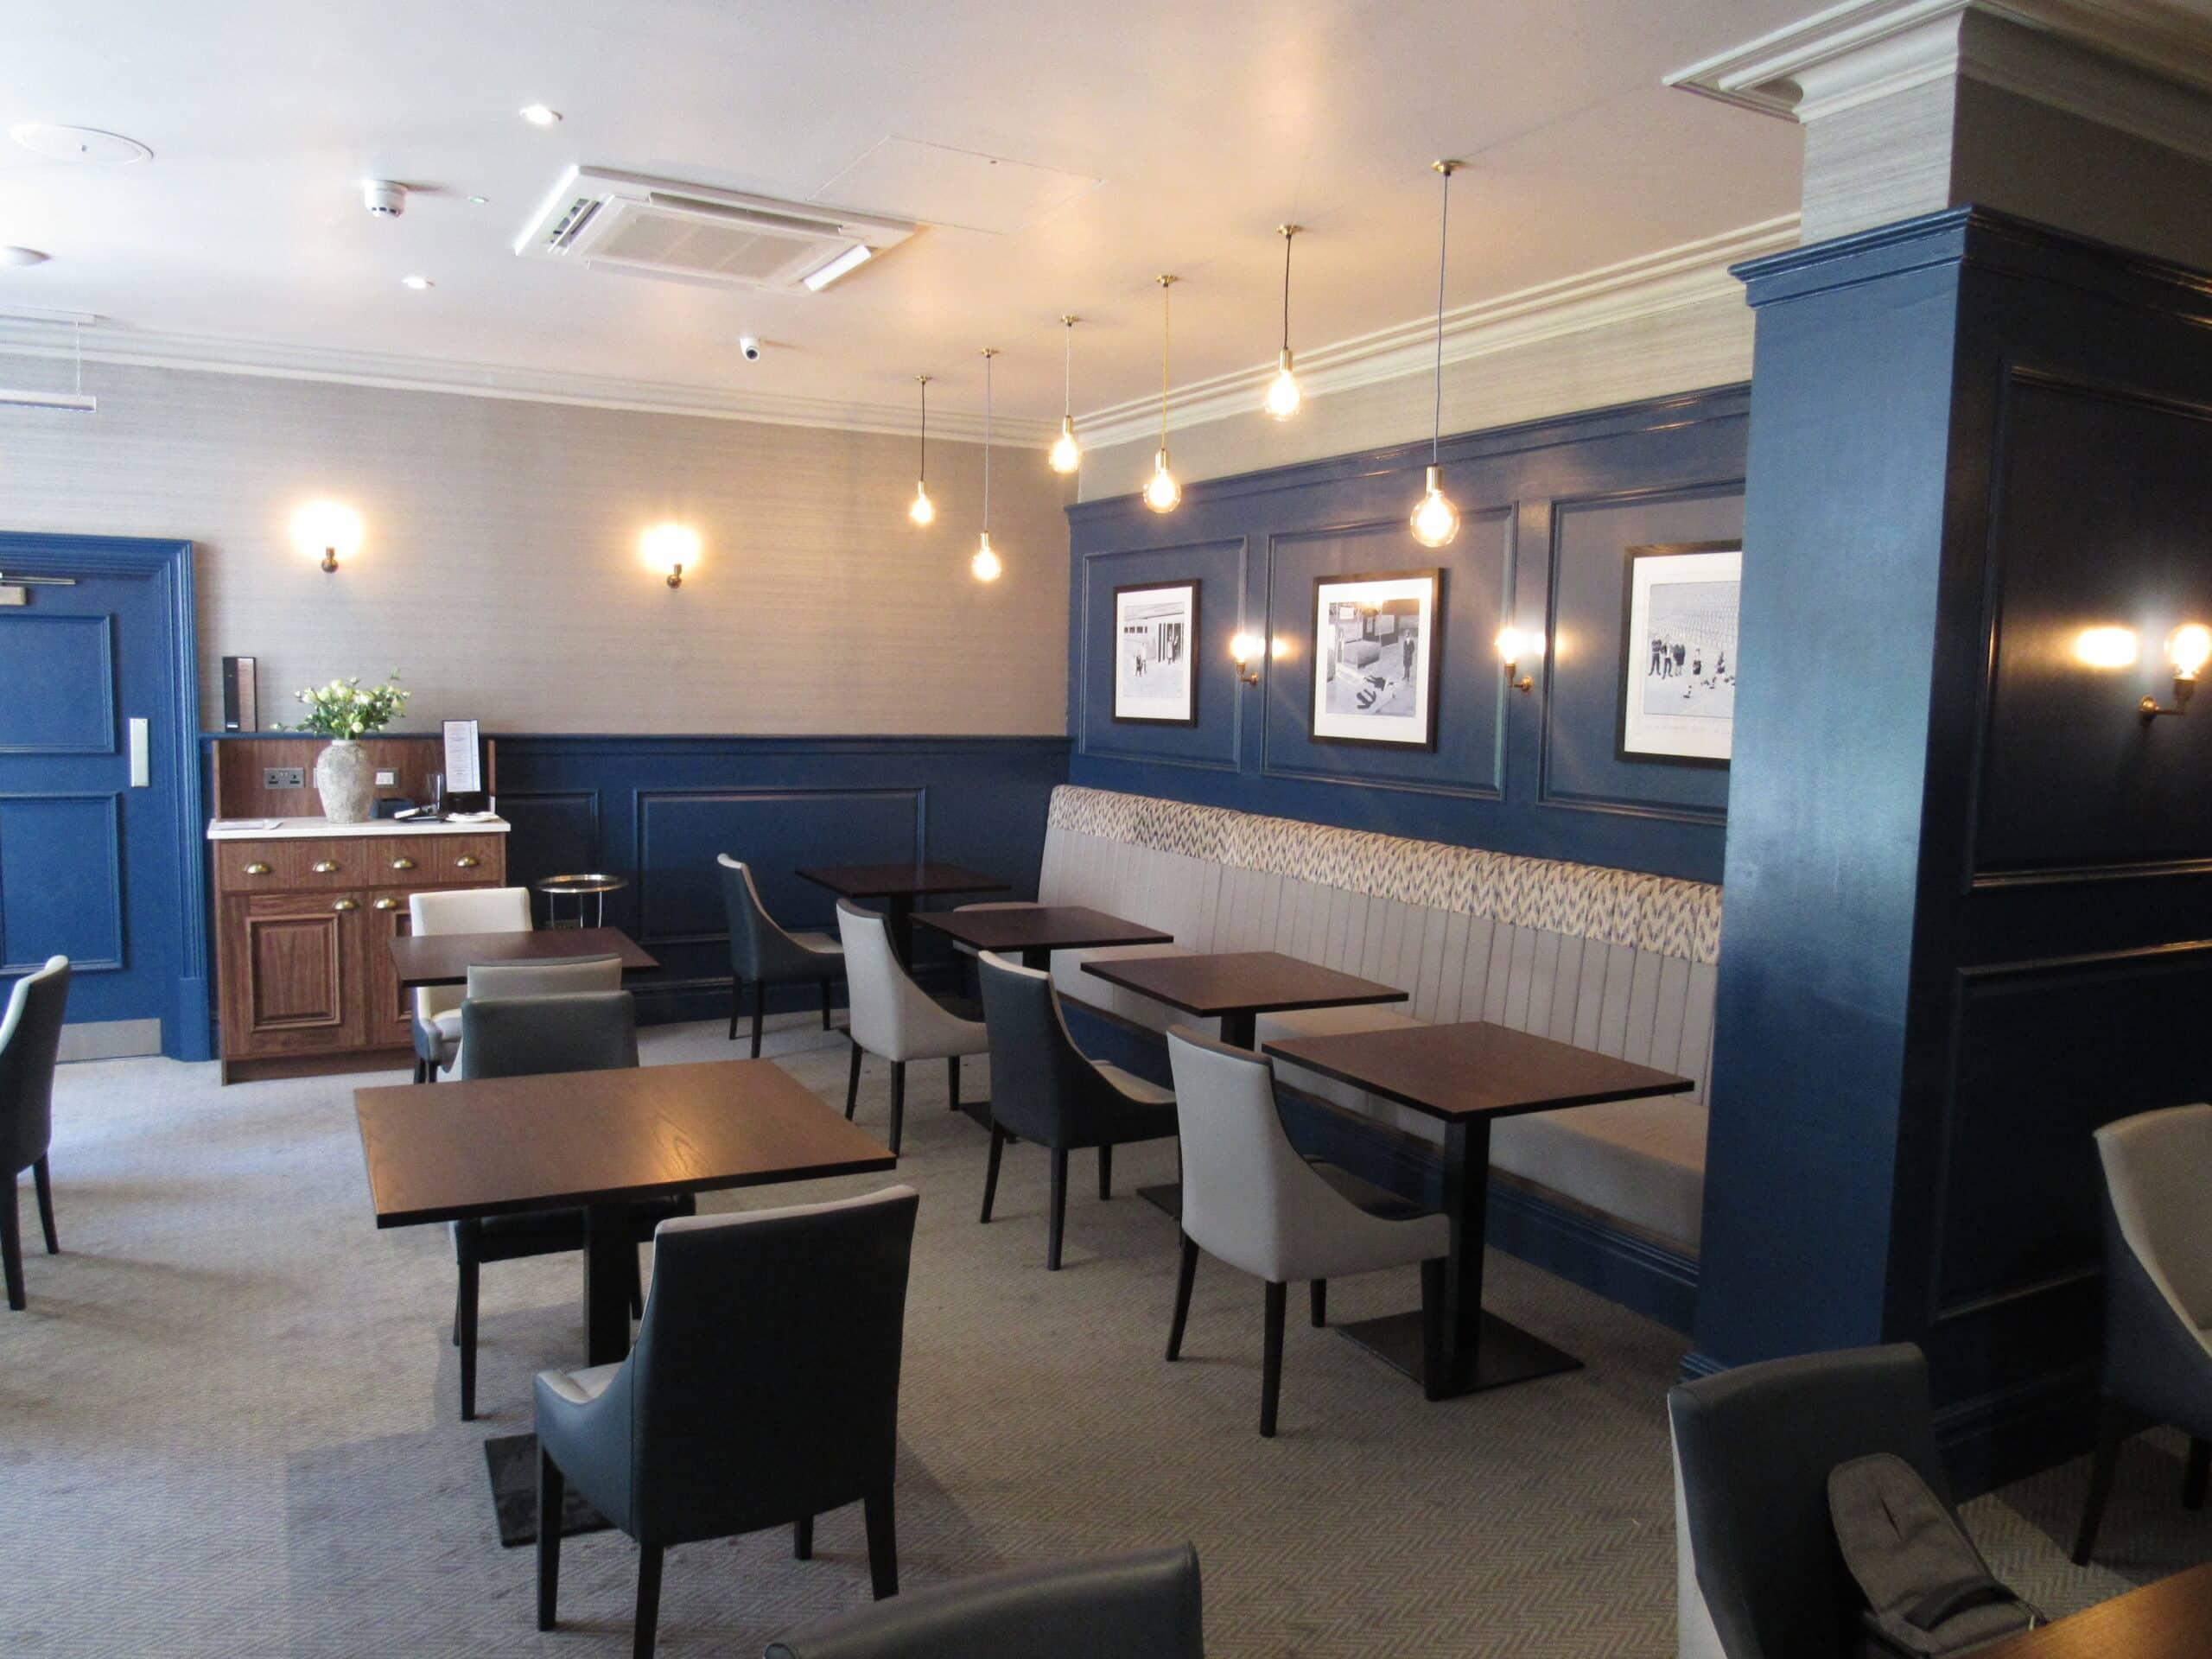 marco-pierre-white-steakhouse-restaurant-furniture-9